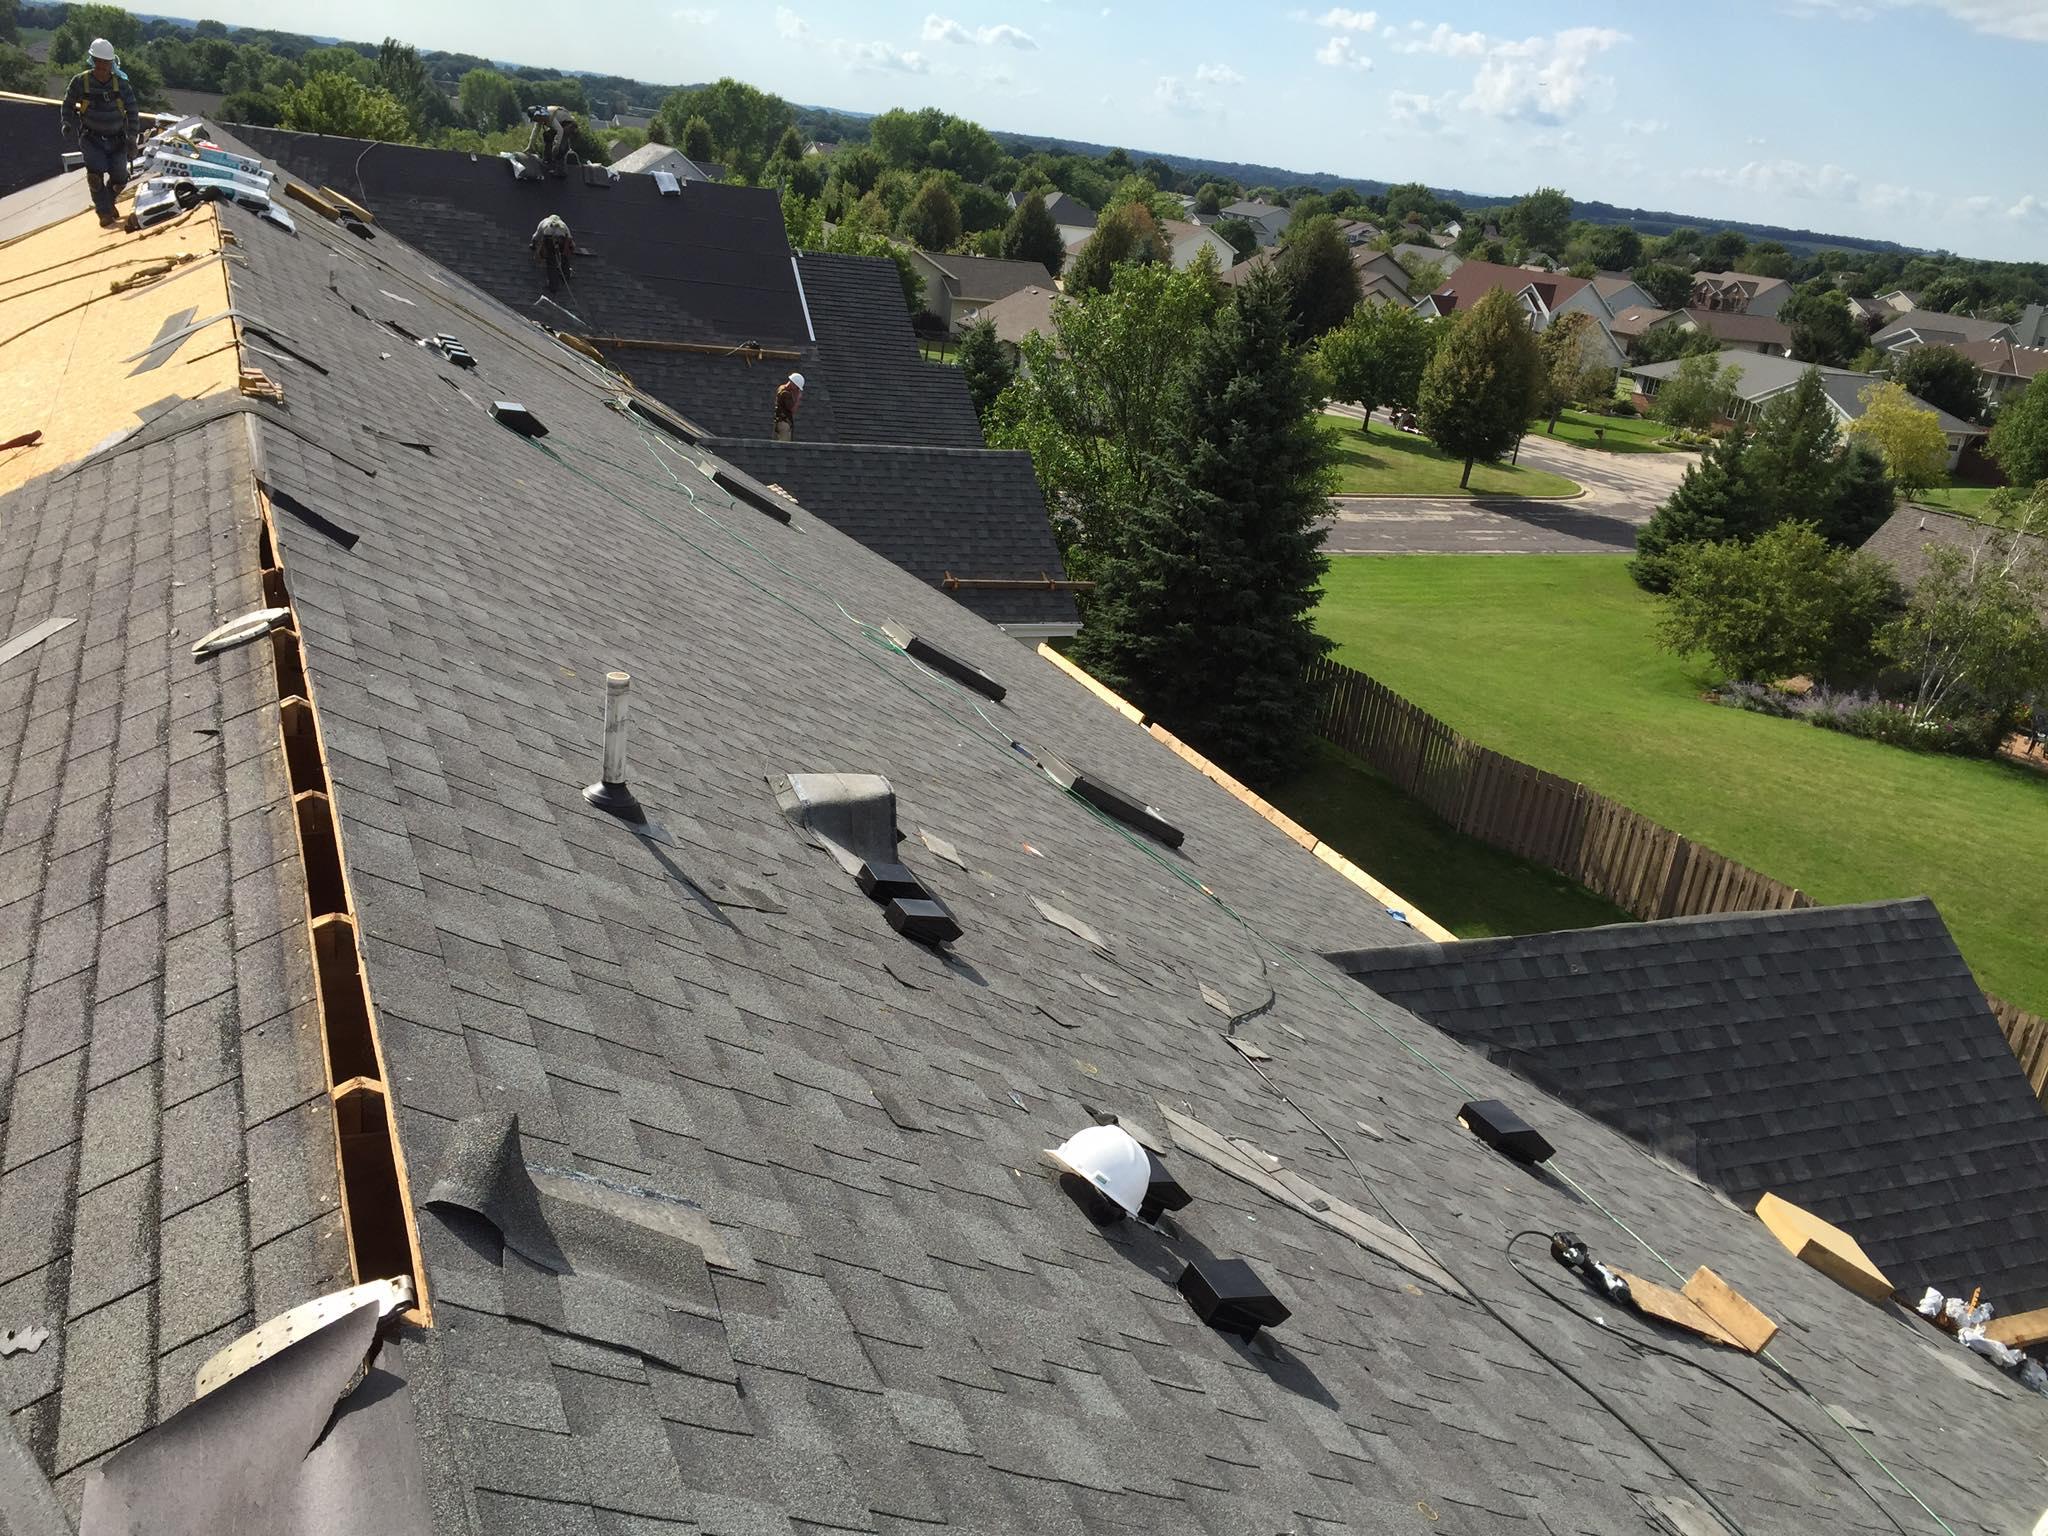 residental-shingle-roof-under-construction